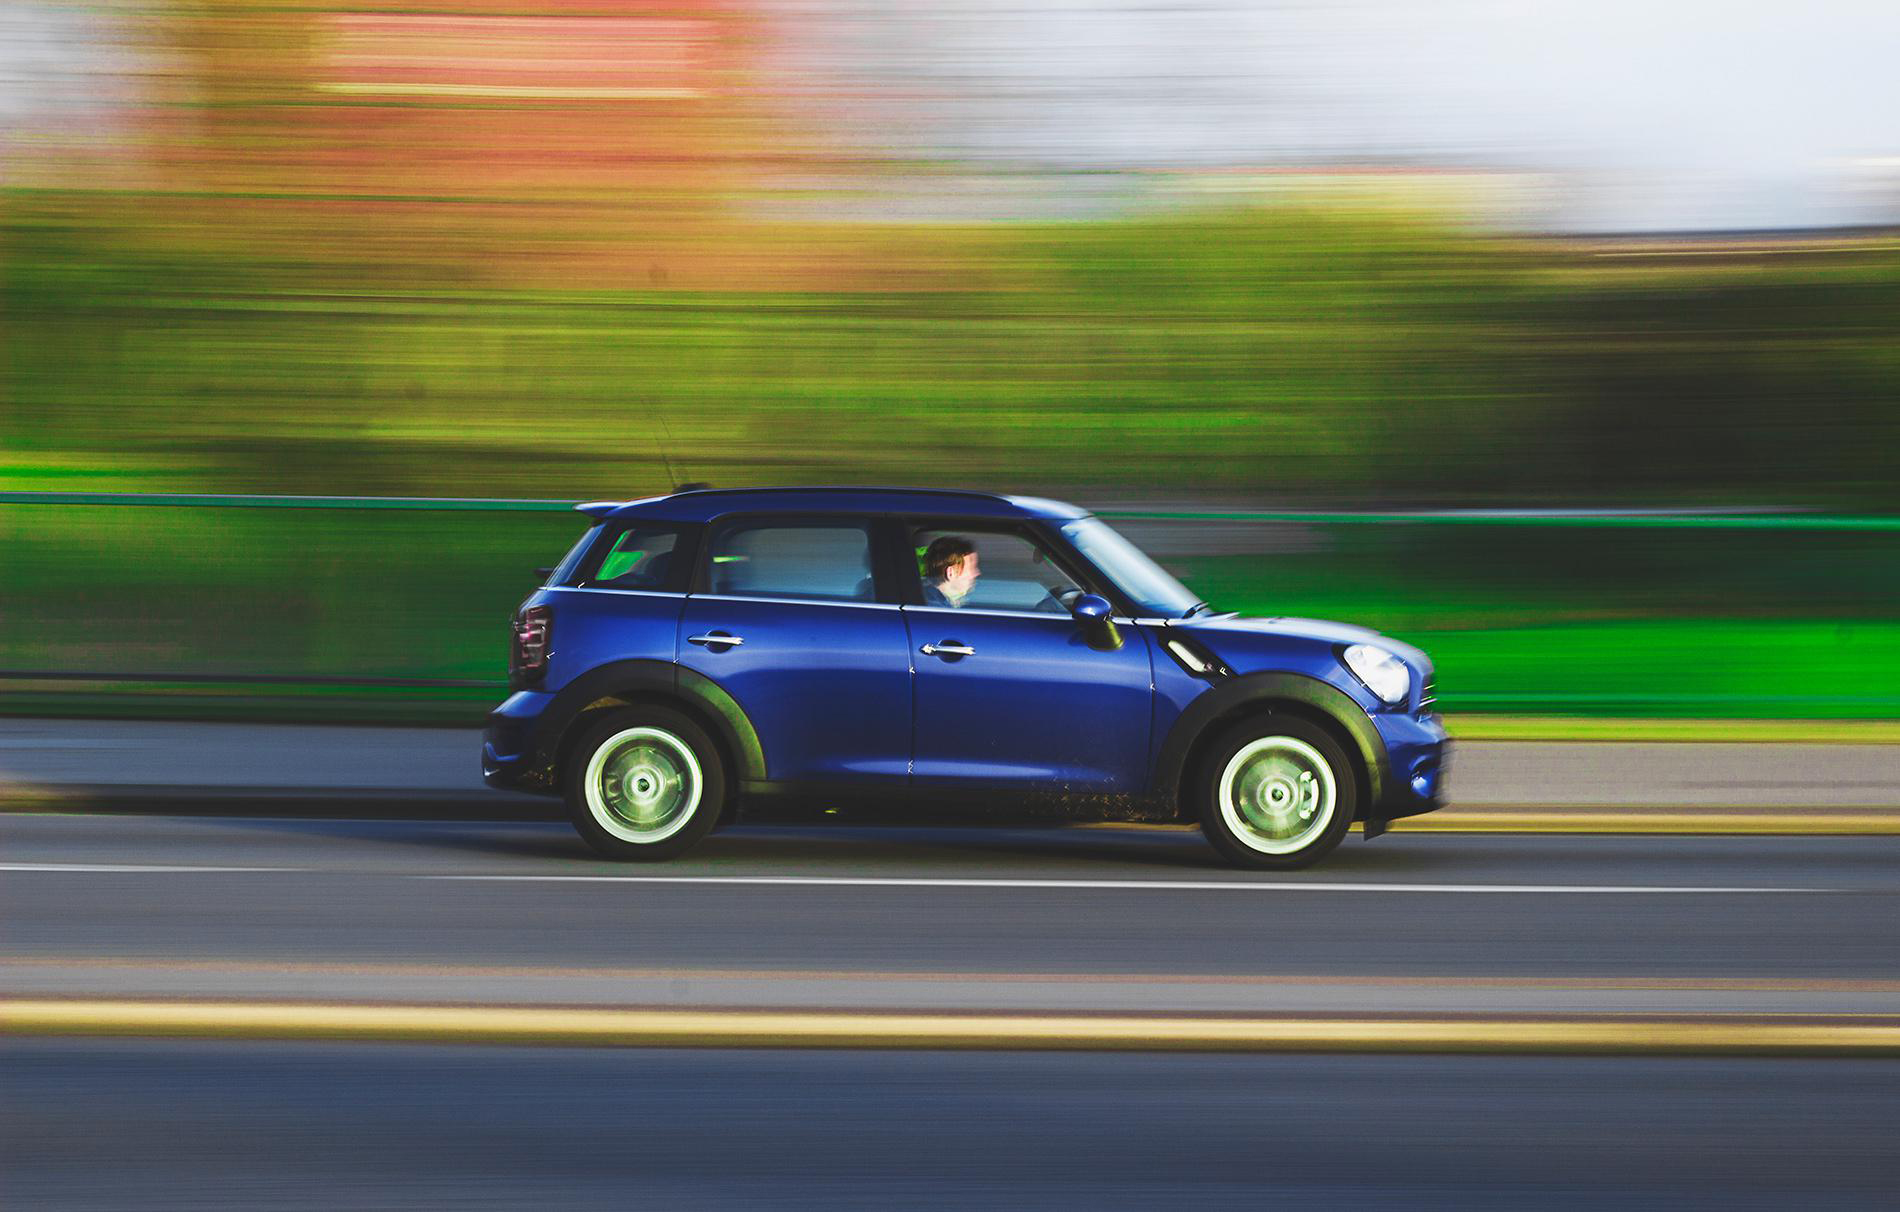 Mini Cooper driving down road